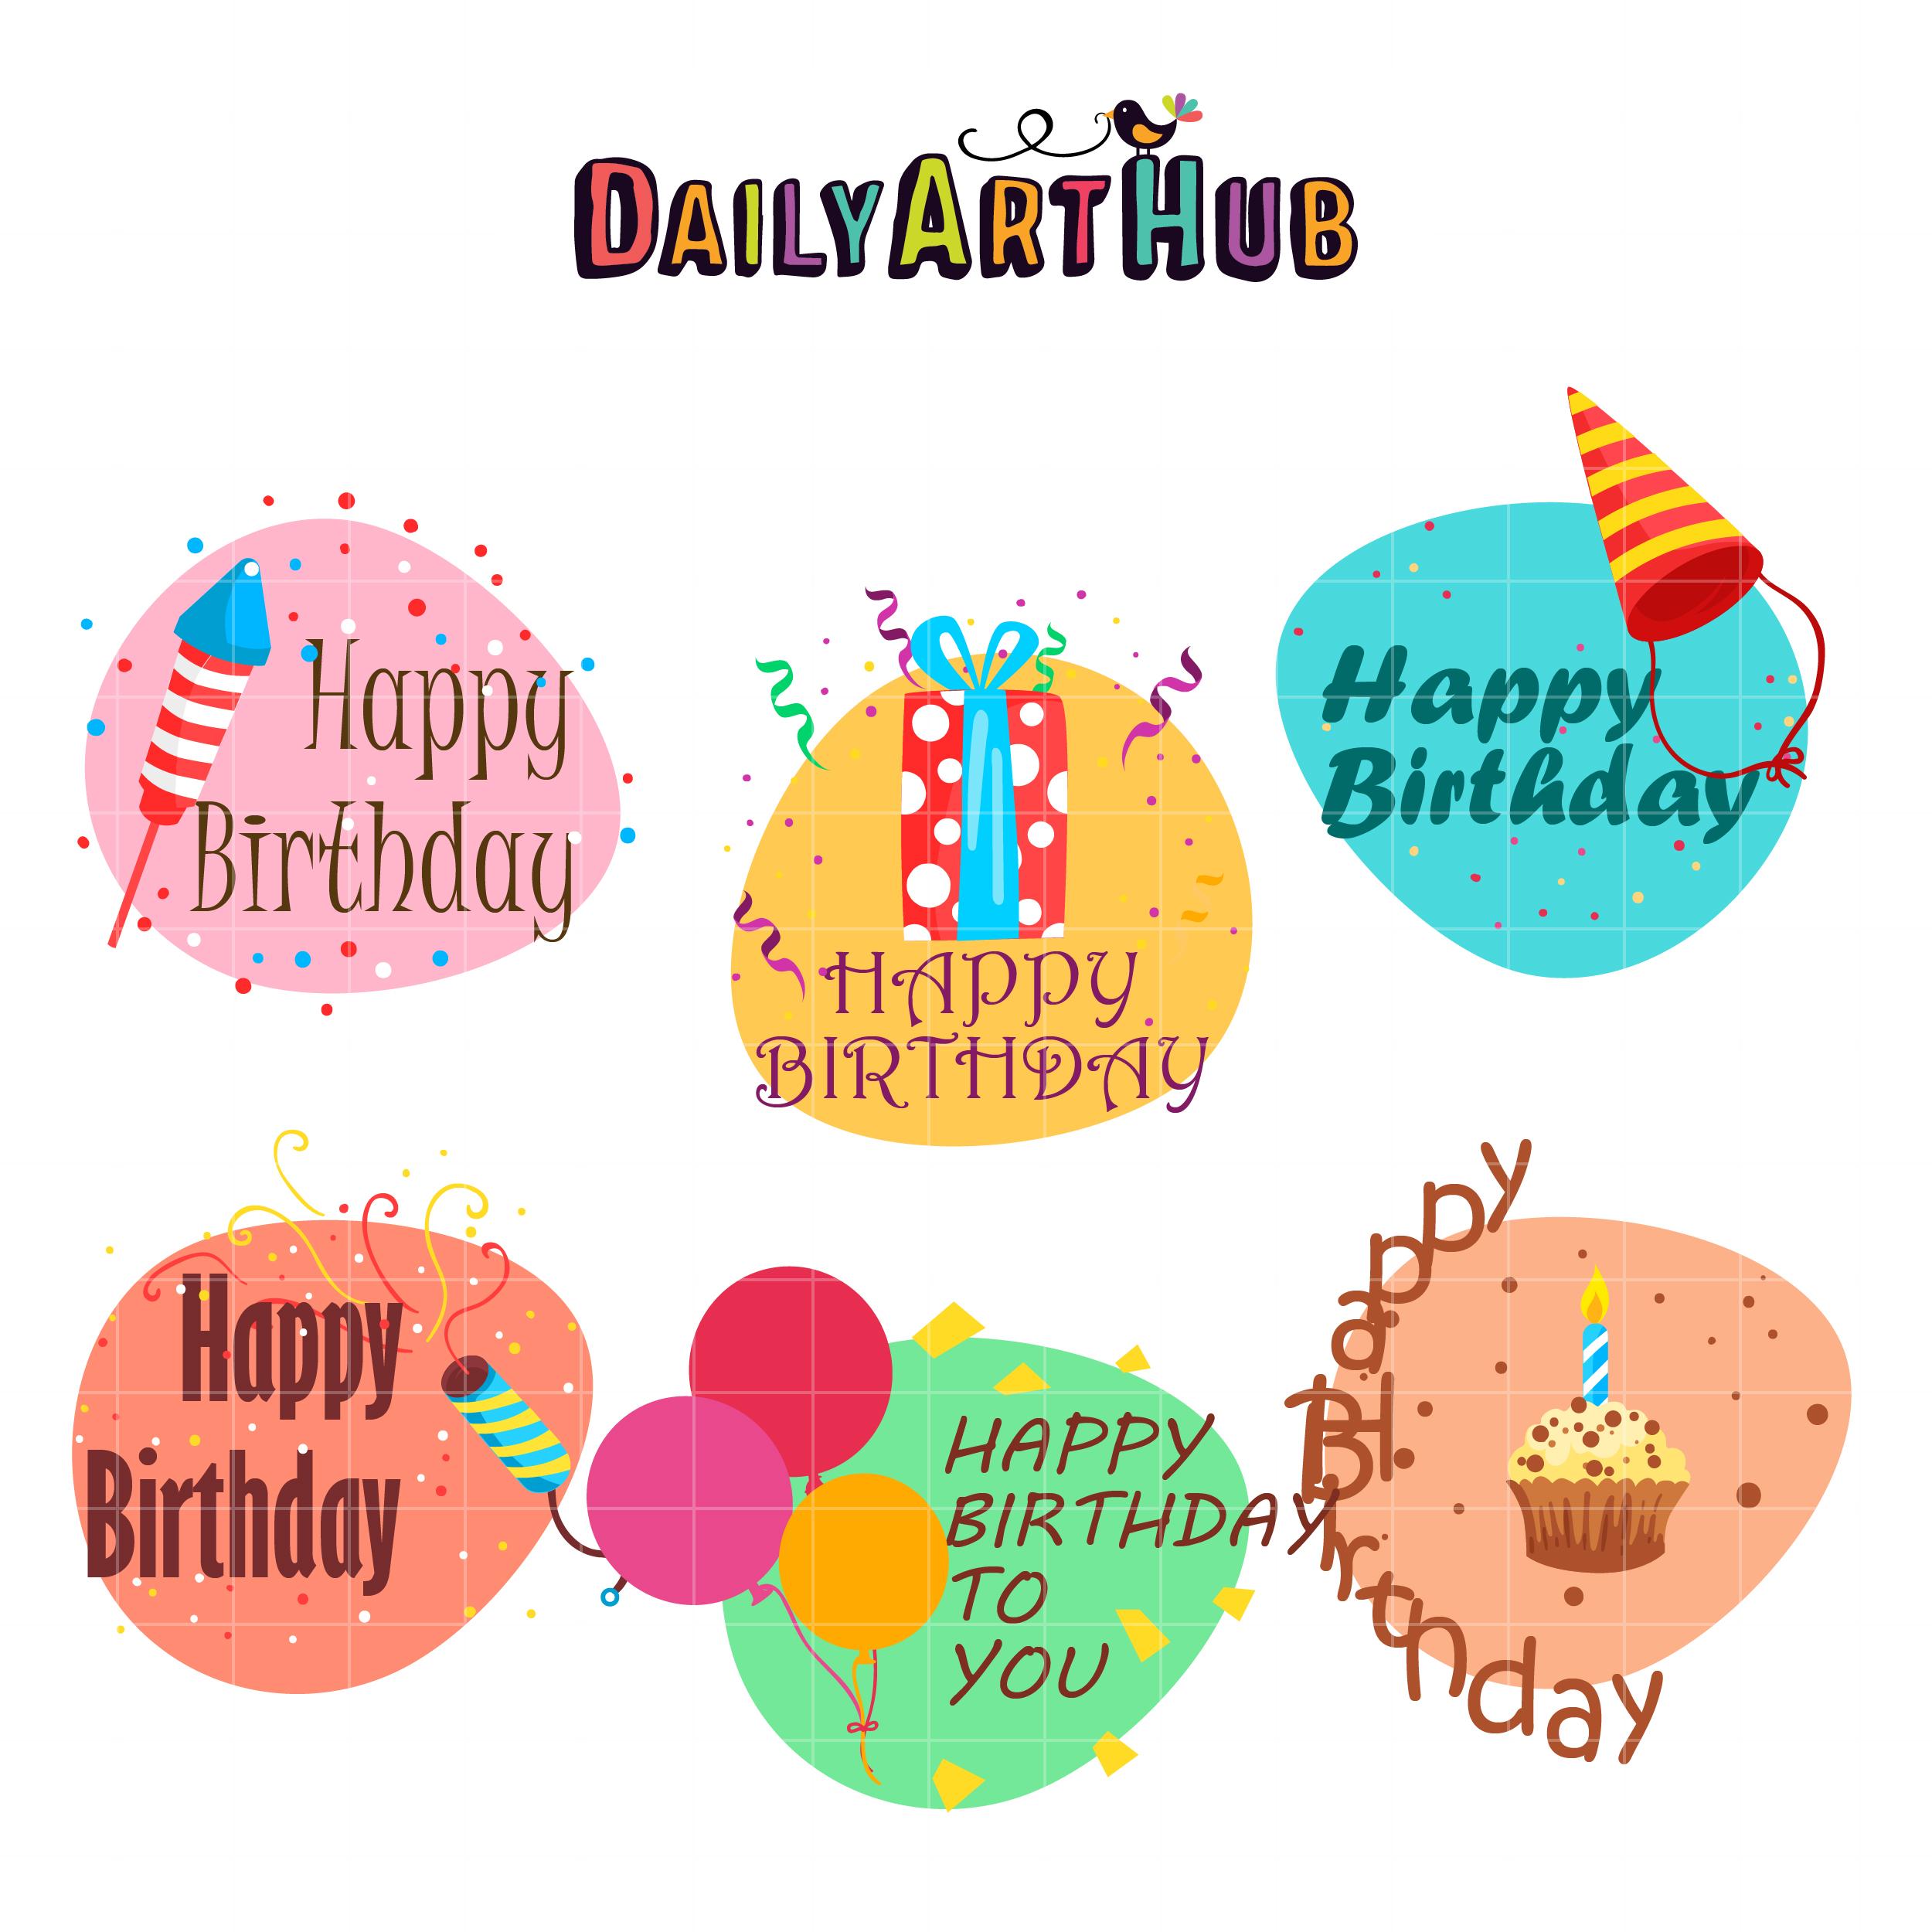 Birthday Greetings Clip Art Set Daily Art Hub Free Clip Art Everyday